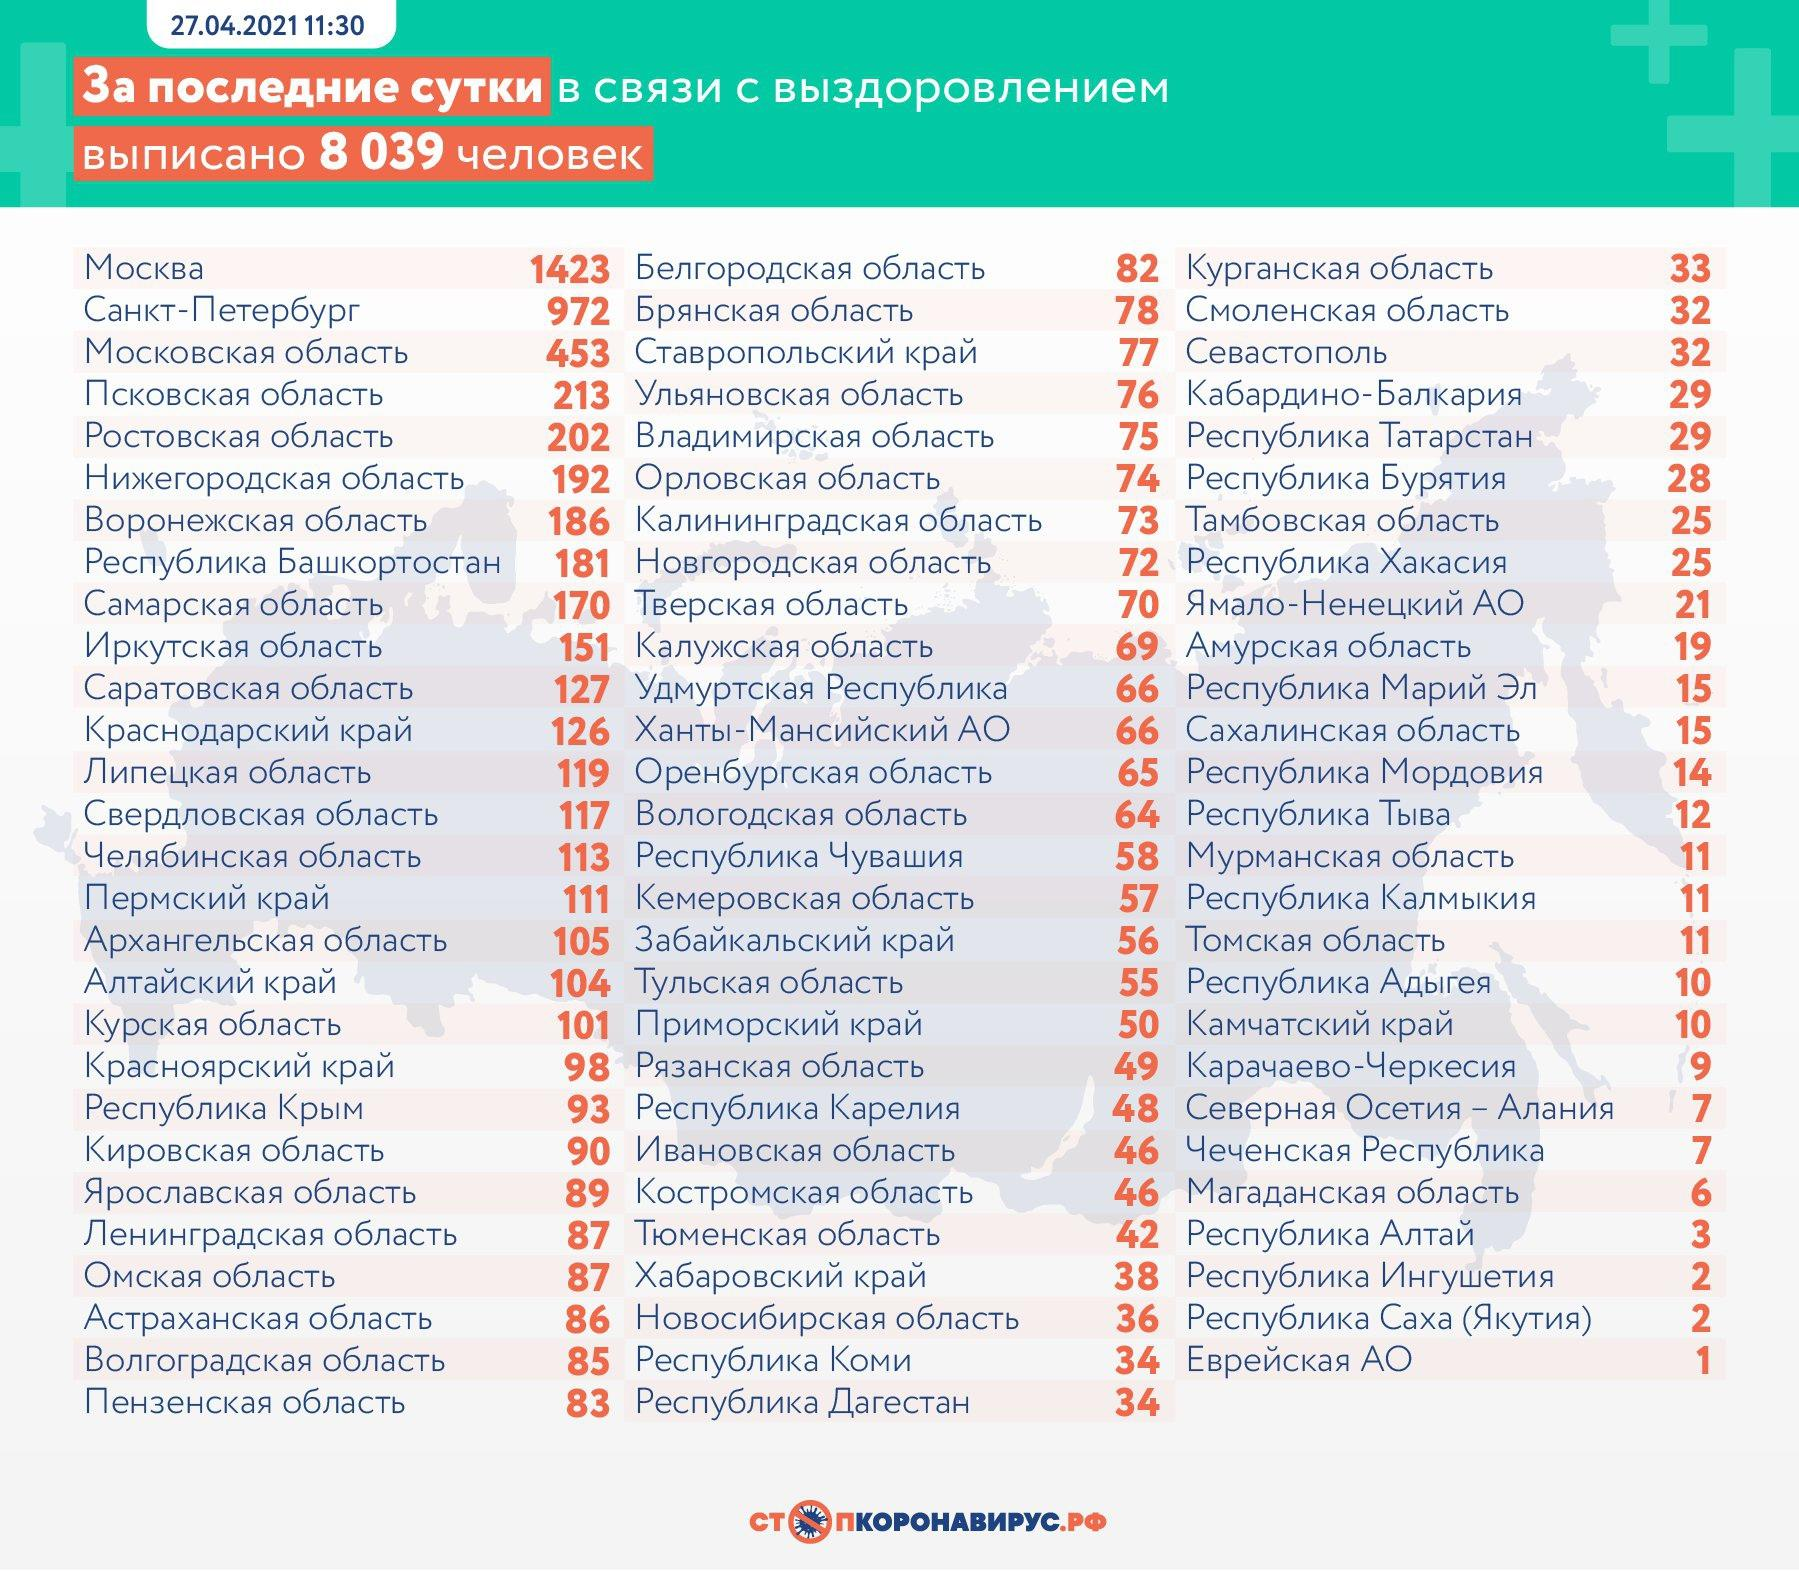 фото В России за сутки от коронавируса умерли 392 человека 3